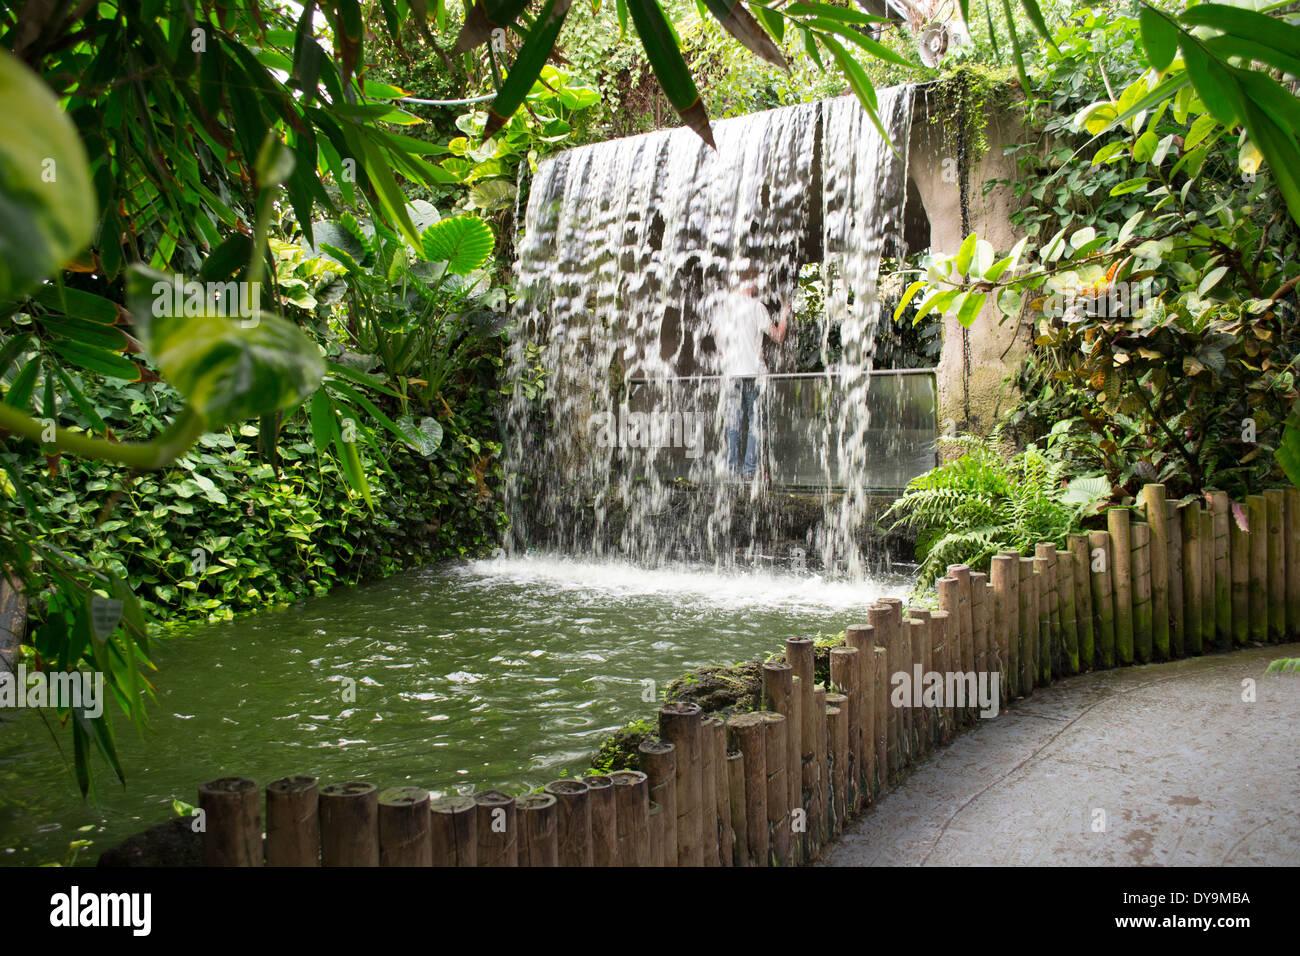 Waterfall in Tropical World, Leeds - Stock Image